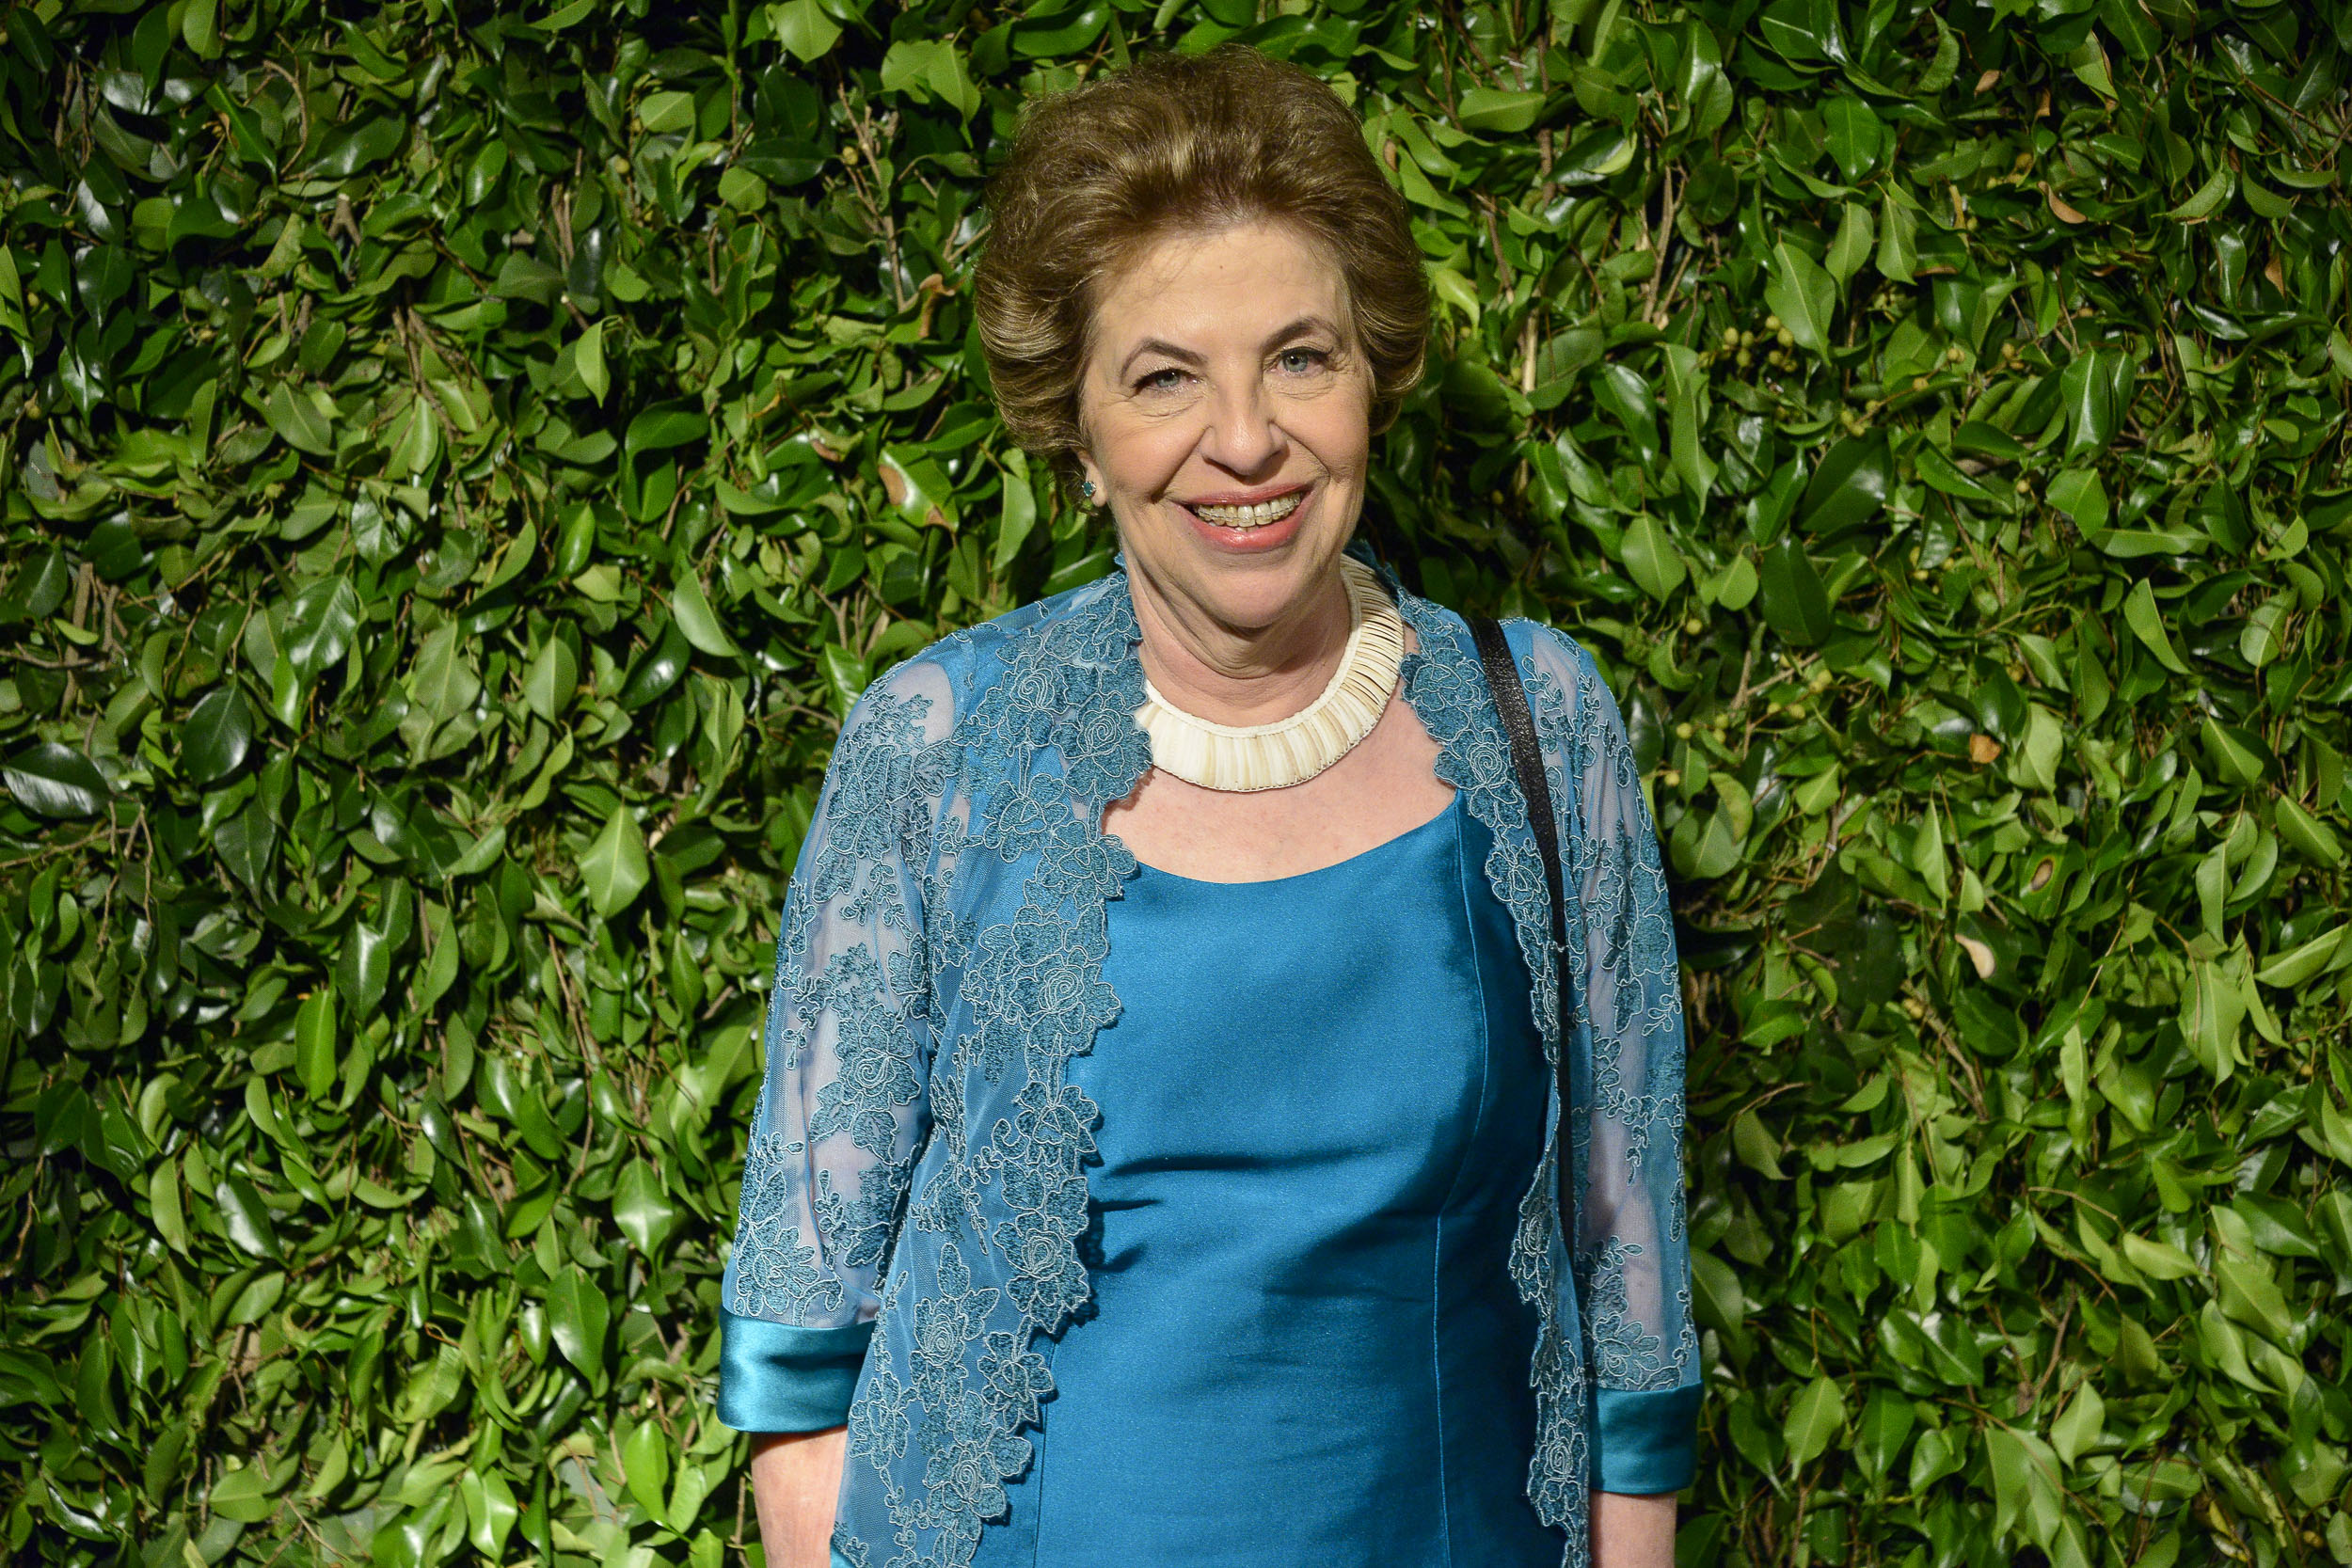 Mary Allegretti BrazilFoundation Gala São Paulo Mulheres Notáveis Women Philanthropy Filantropia